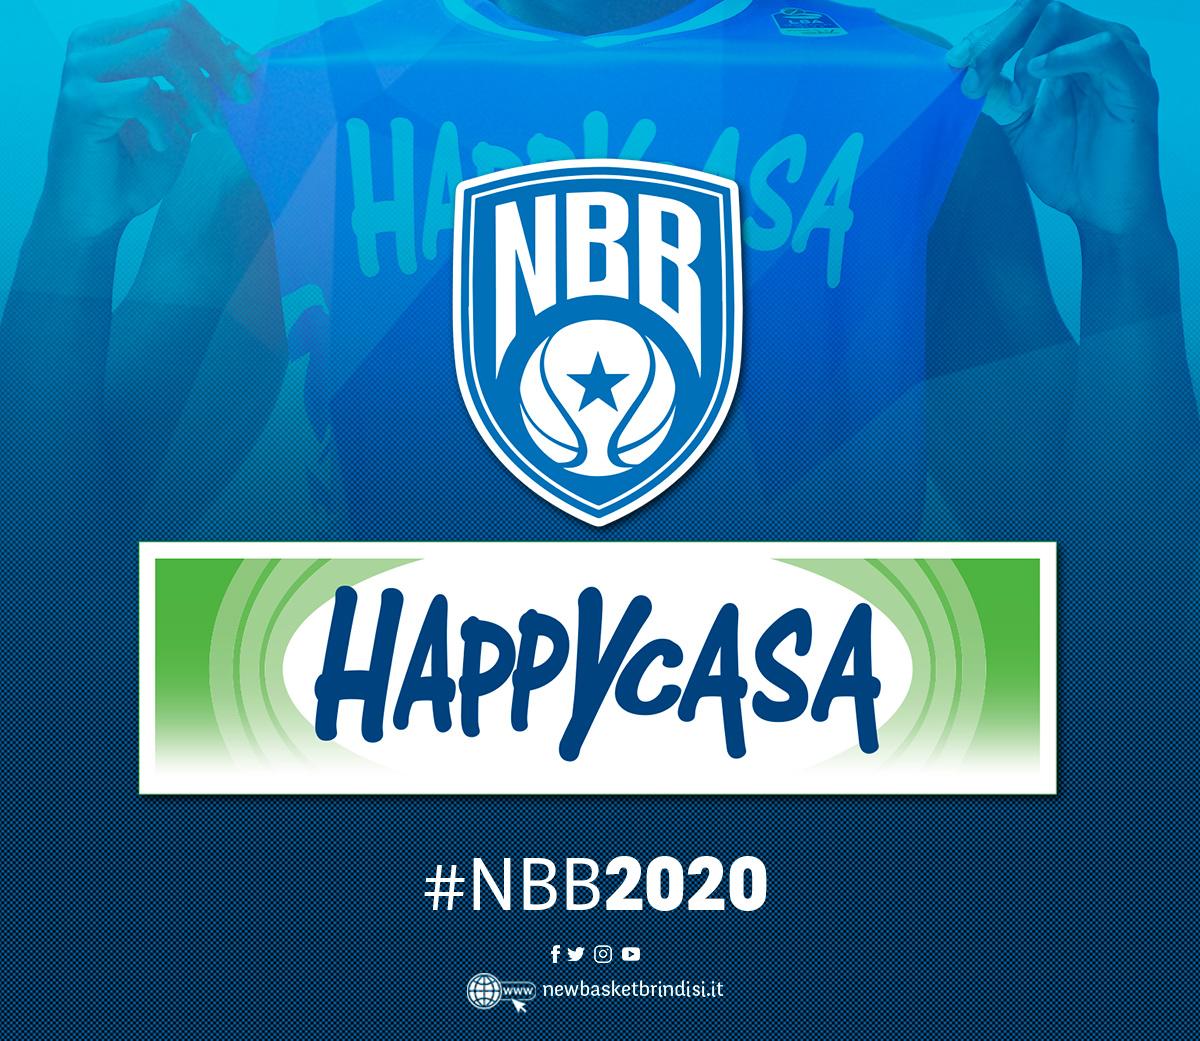 #NBB2020 Happy Casa e New Basket Brindisi ancora insieme!